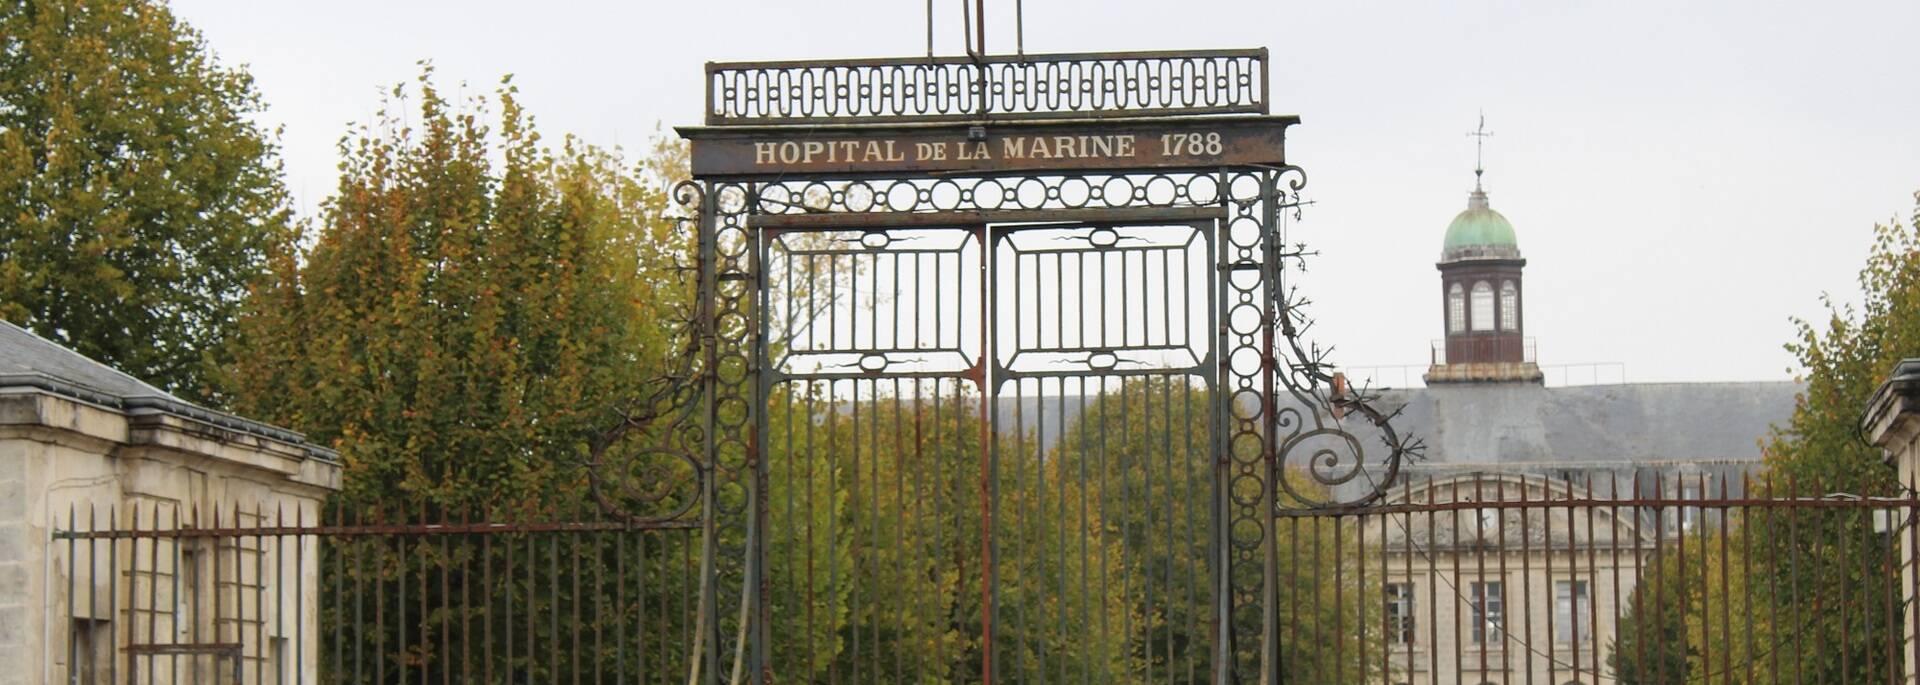 L'Hôpital de la Marine, juste à côté du musée de la médecine navale - ©P.Migaud / FDHPA 17